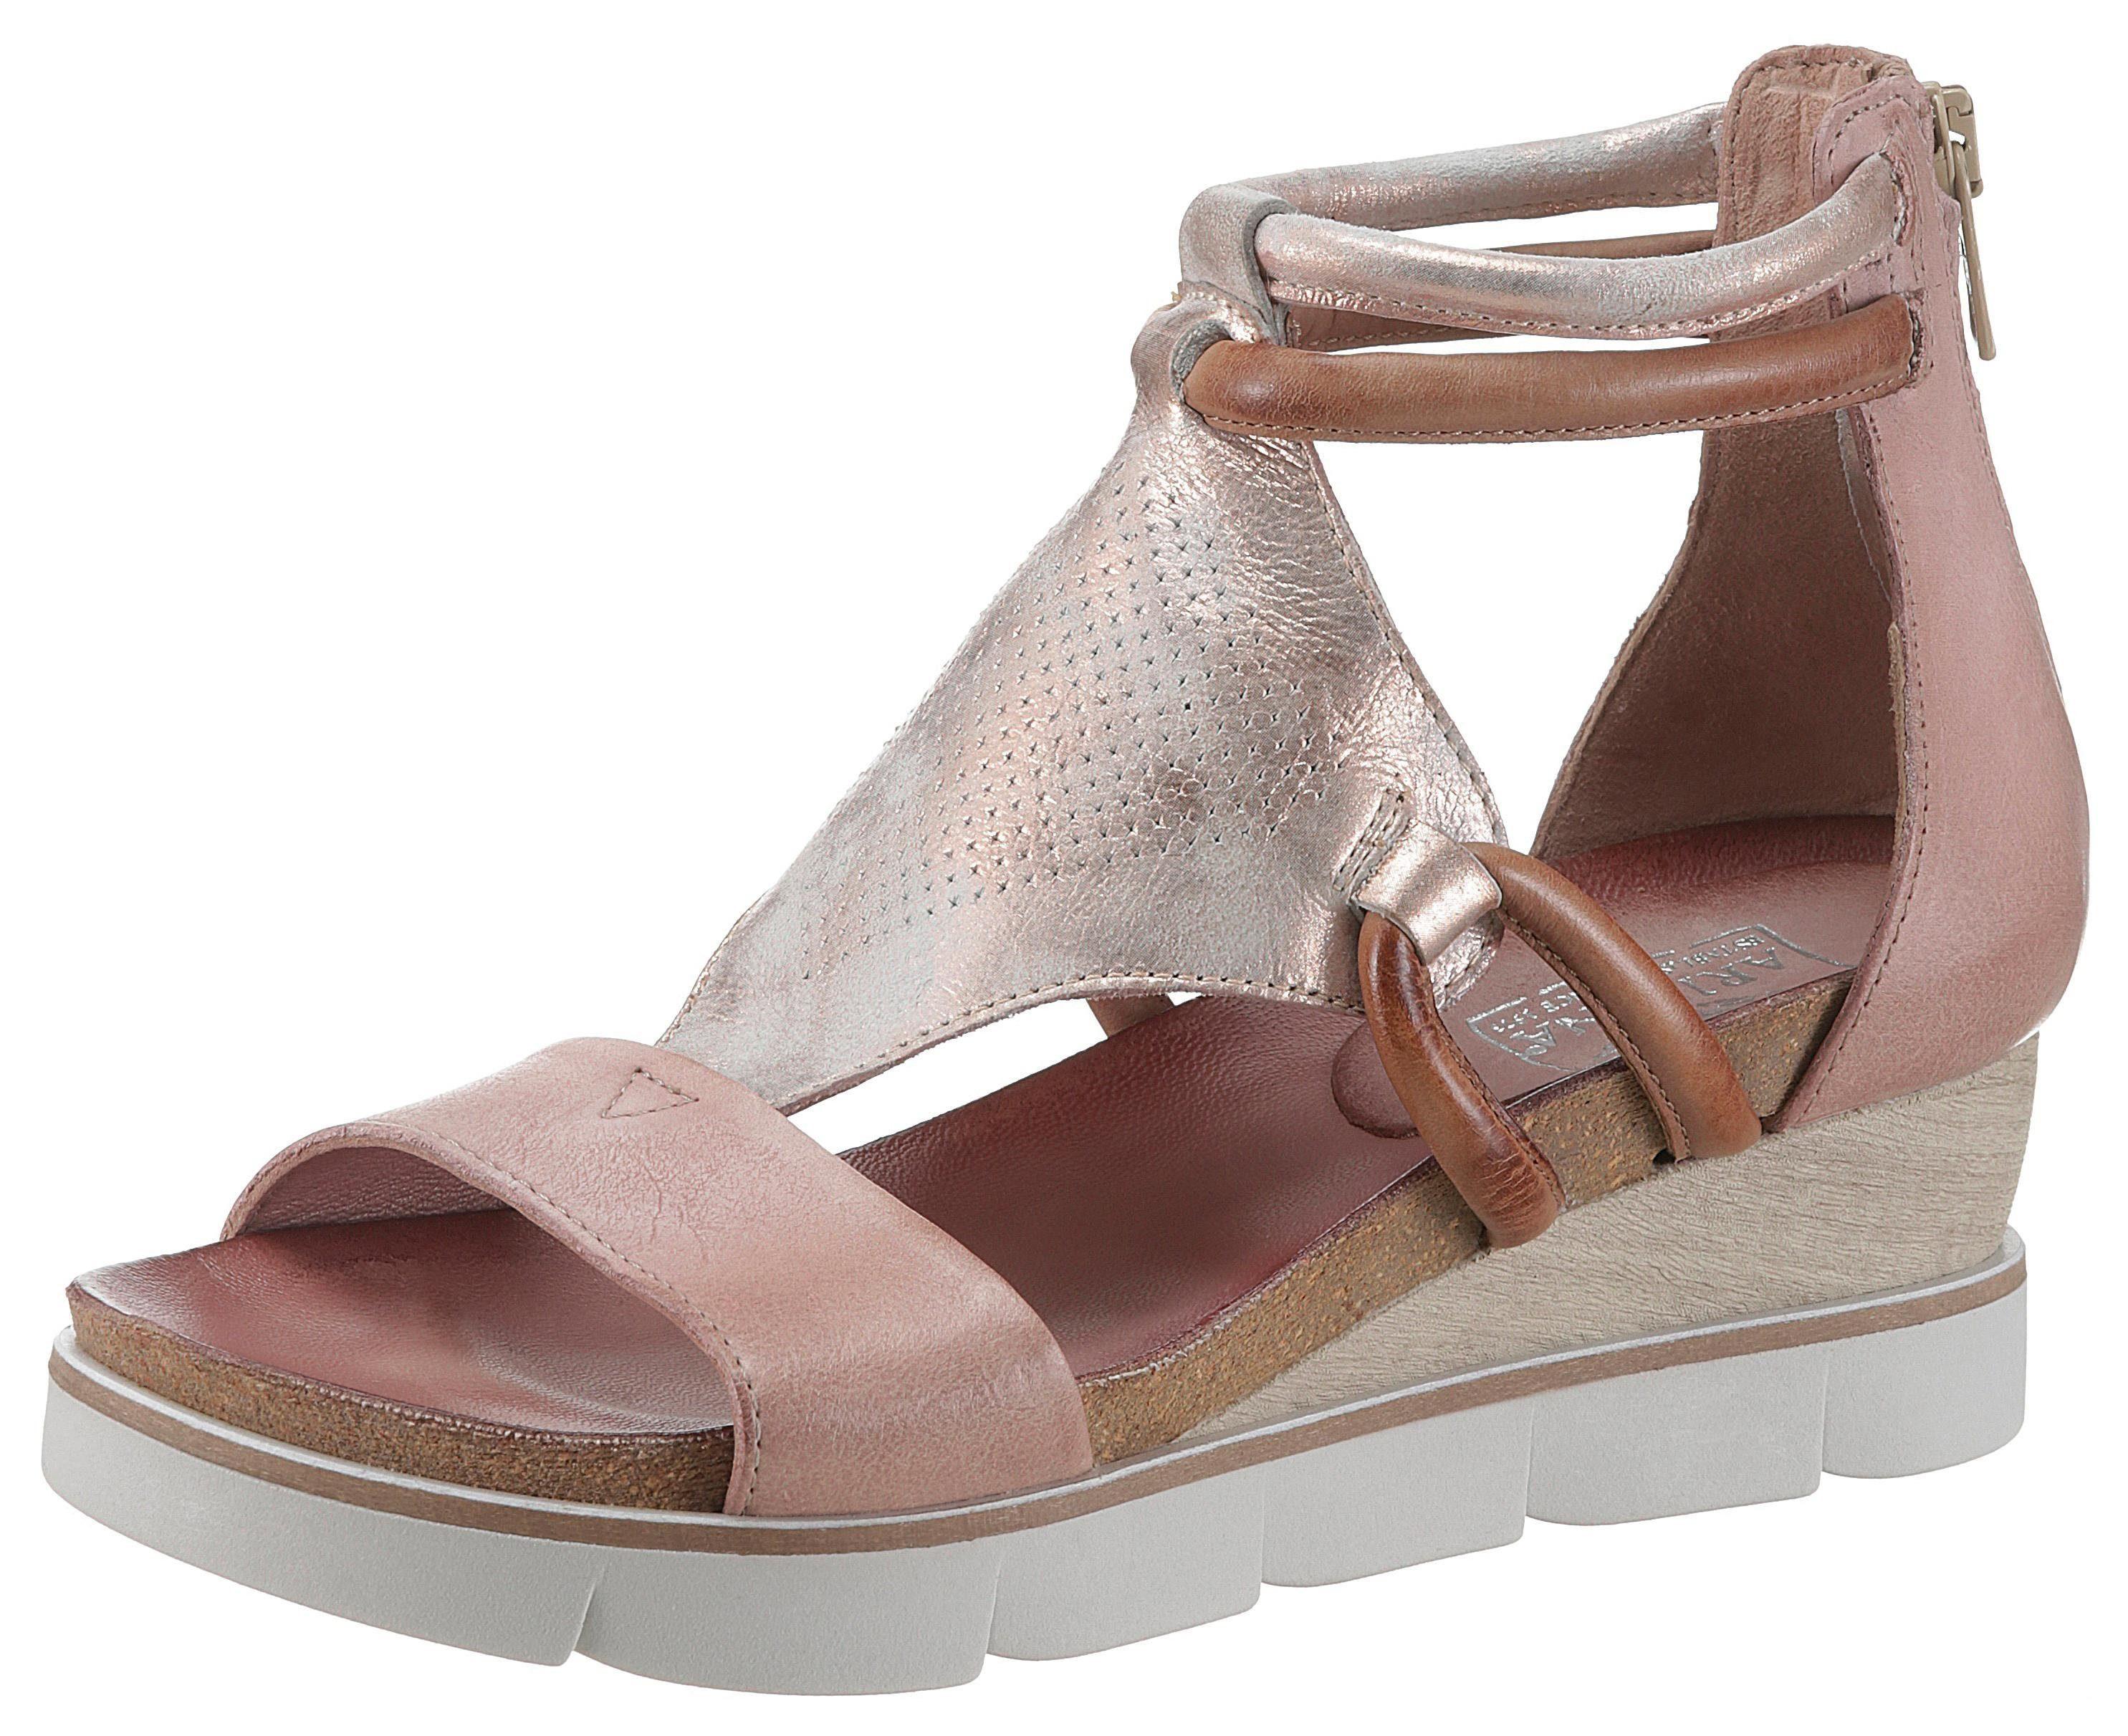 Arizona Einsatz Mit Metallic Sandalette KaufenOtto Ok8nX0wP